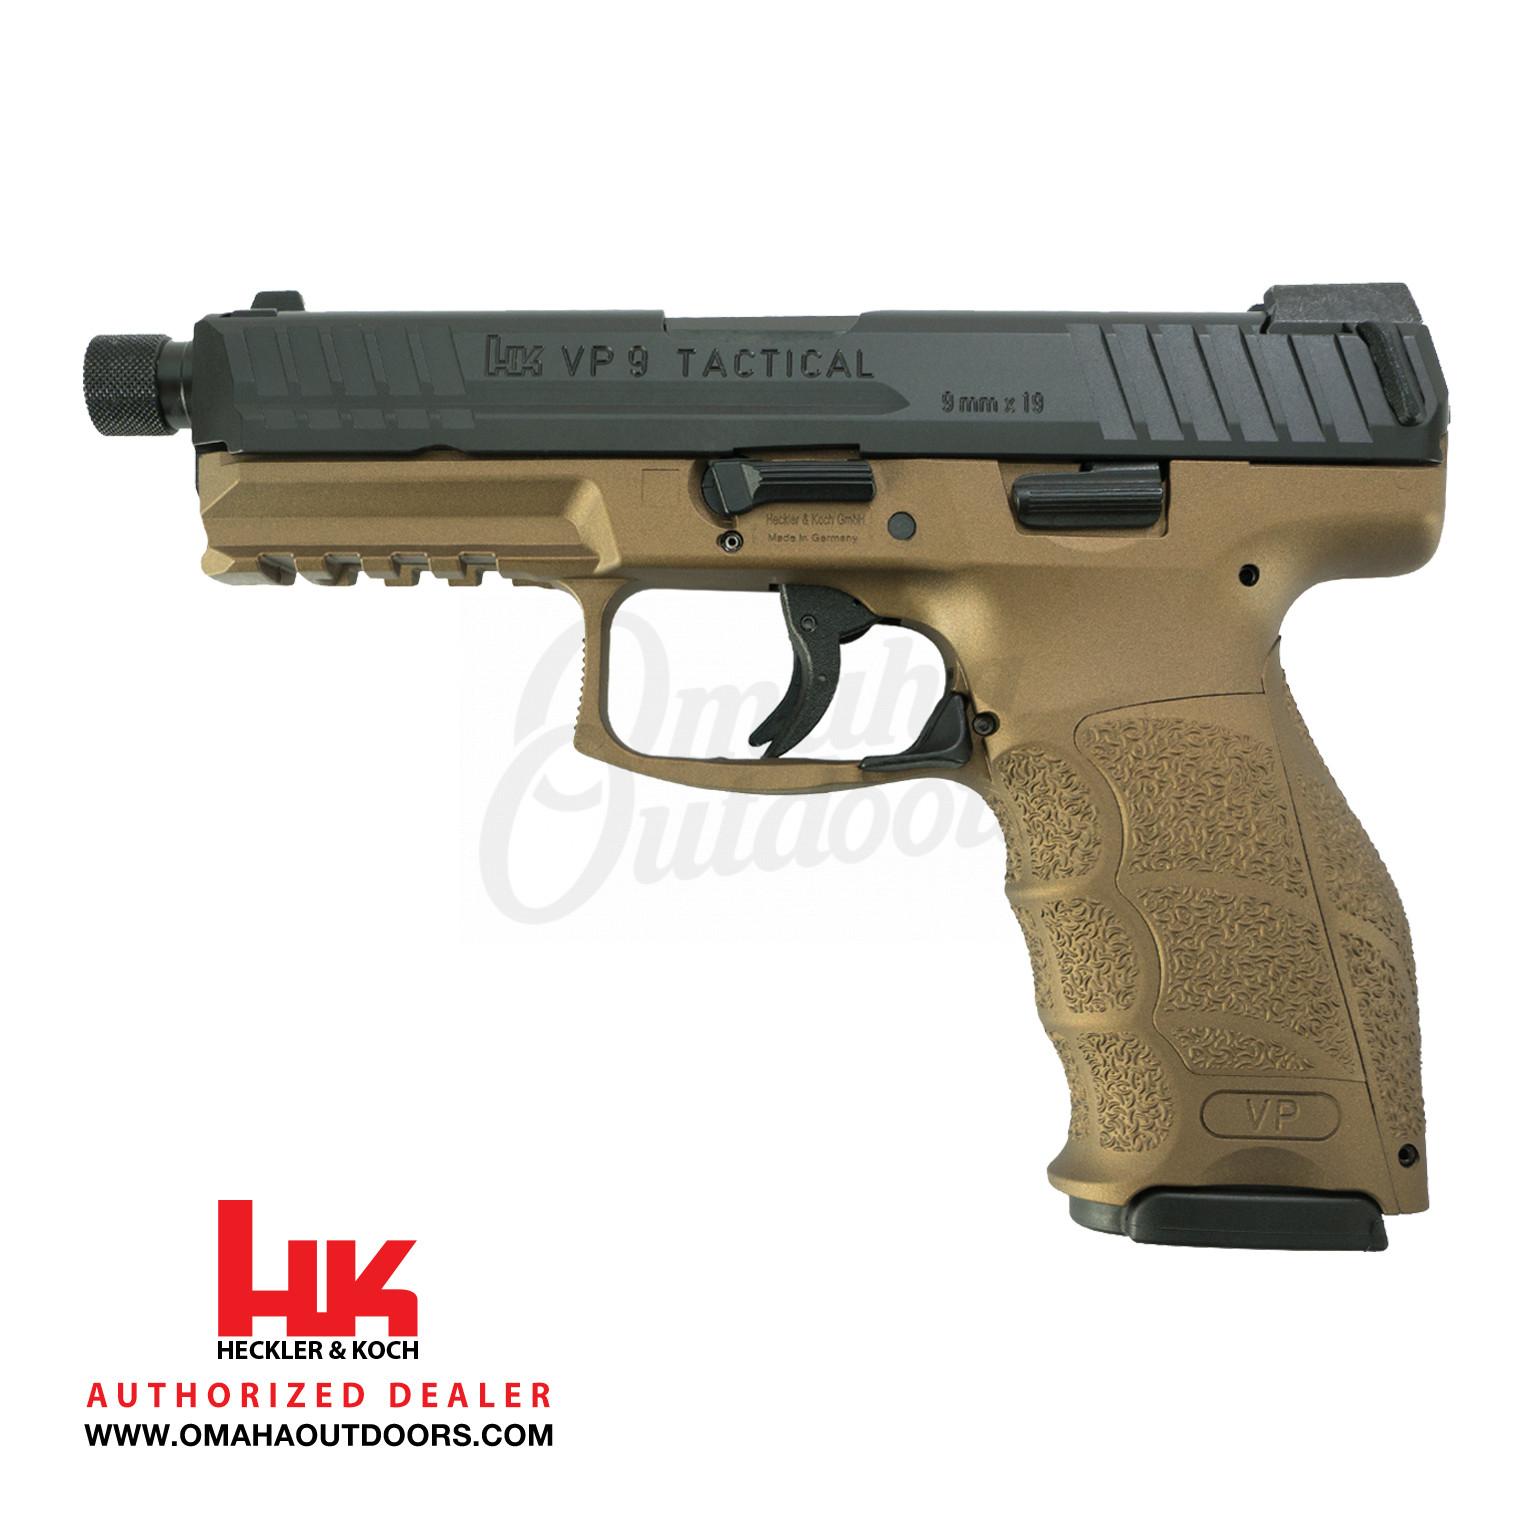 HK VP9 Tactical LE Burnt Bronze TB Pistol 15 RD 9mm Night